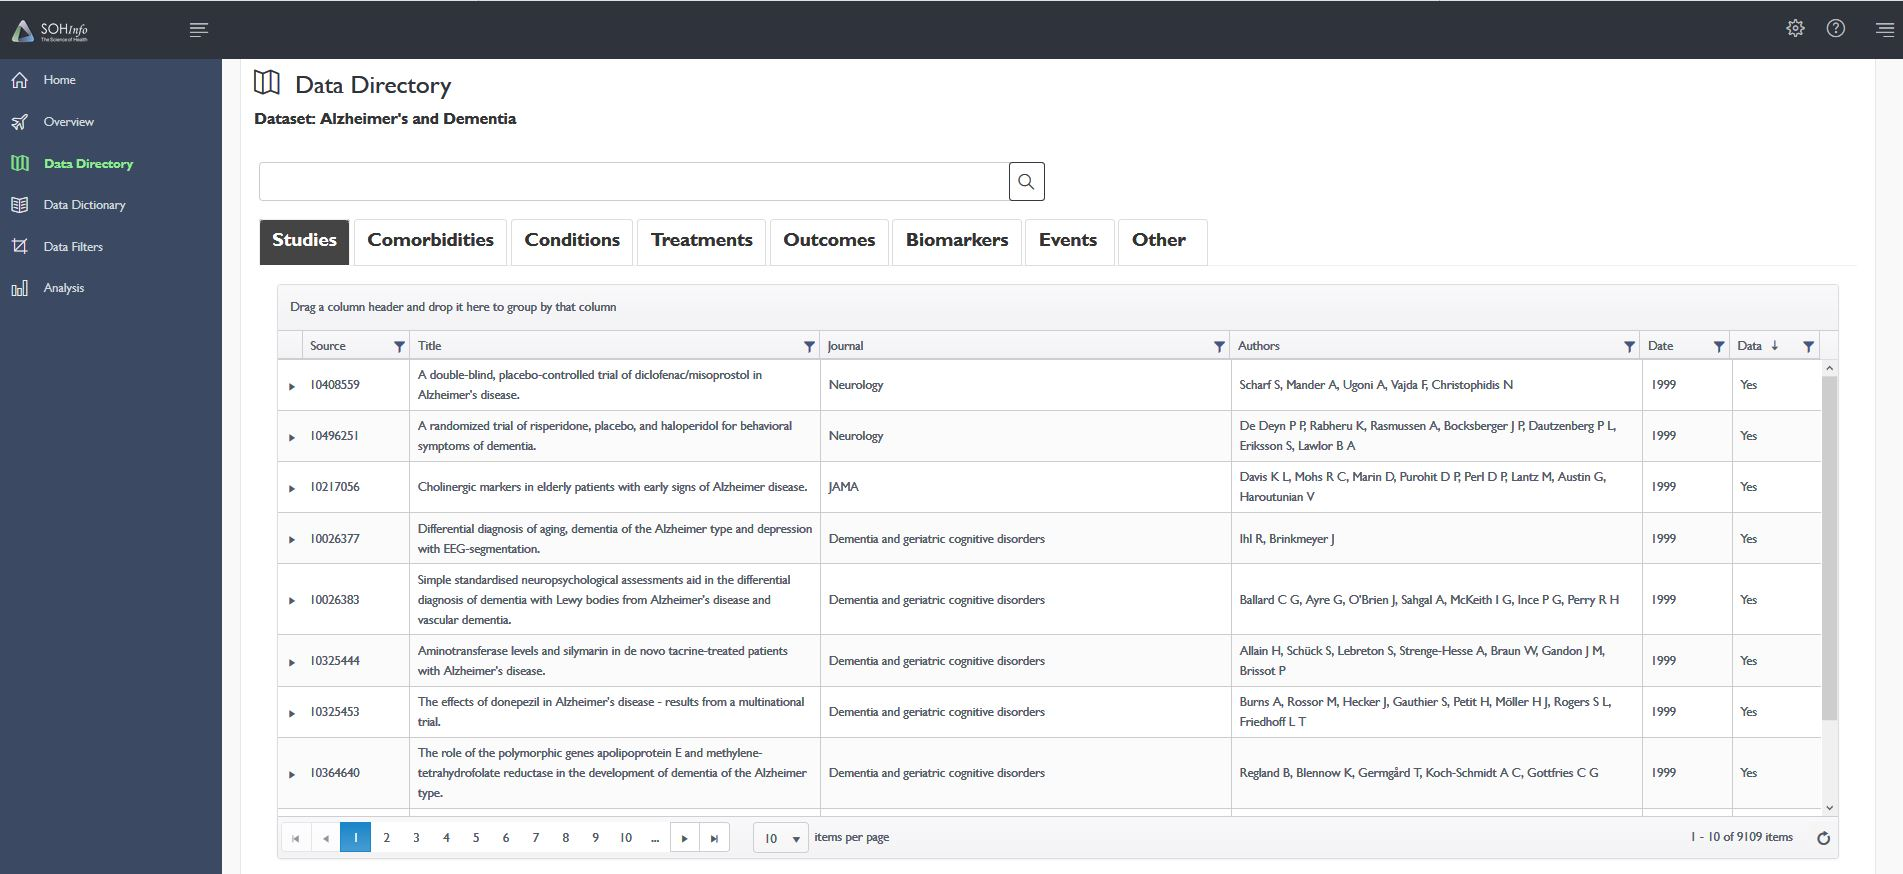 SOHInfo Data Directory